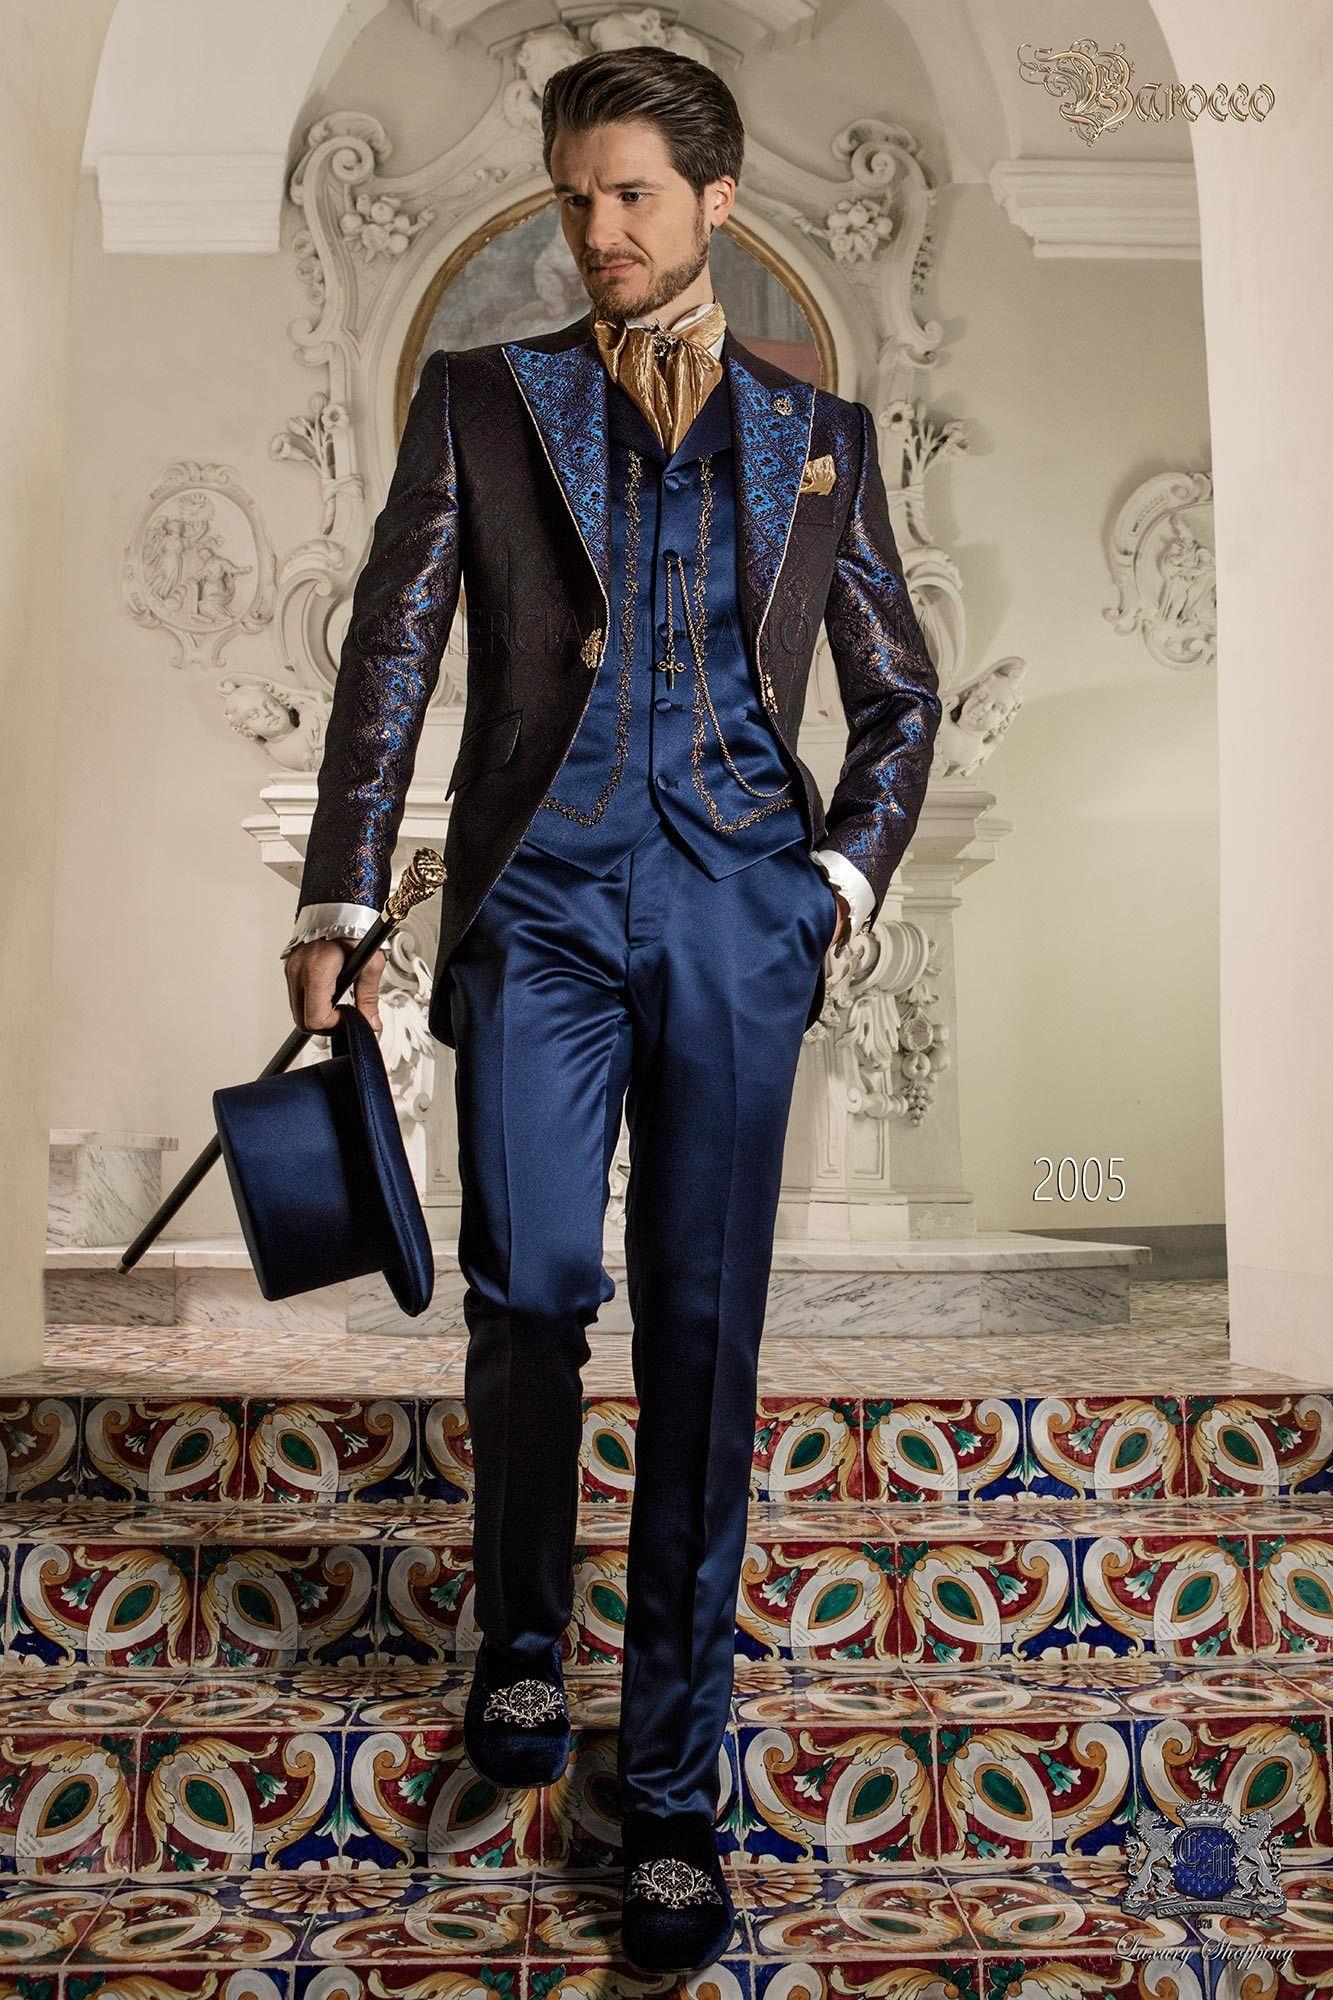 Redingote baroque brochée bleu royal et doré avec boutons doré. Costume de  mariage 2005 Collection Baroque Ottavio Nuccio Gala. 89eab630615